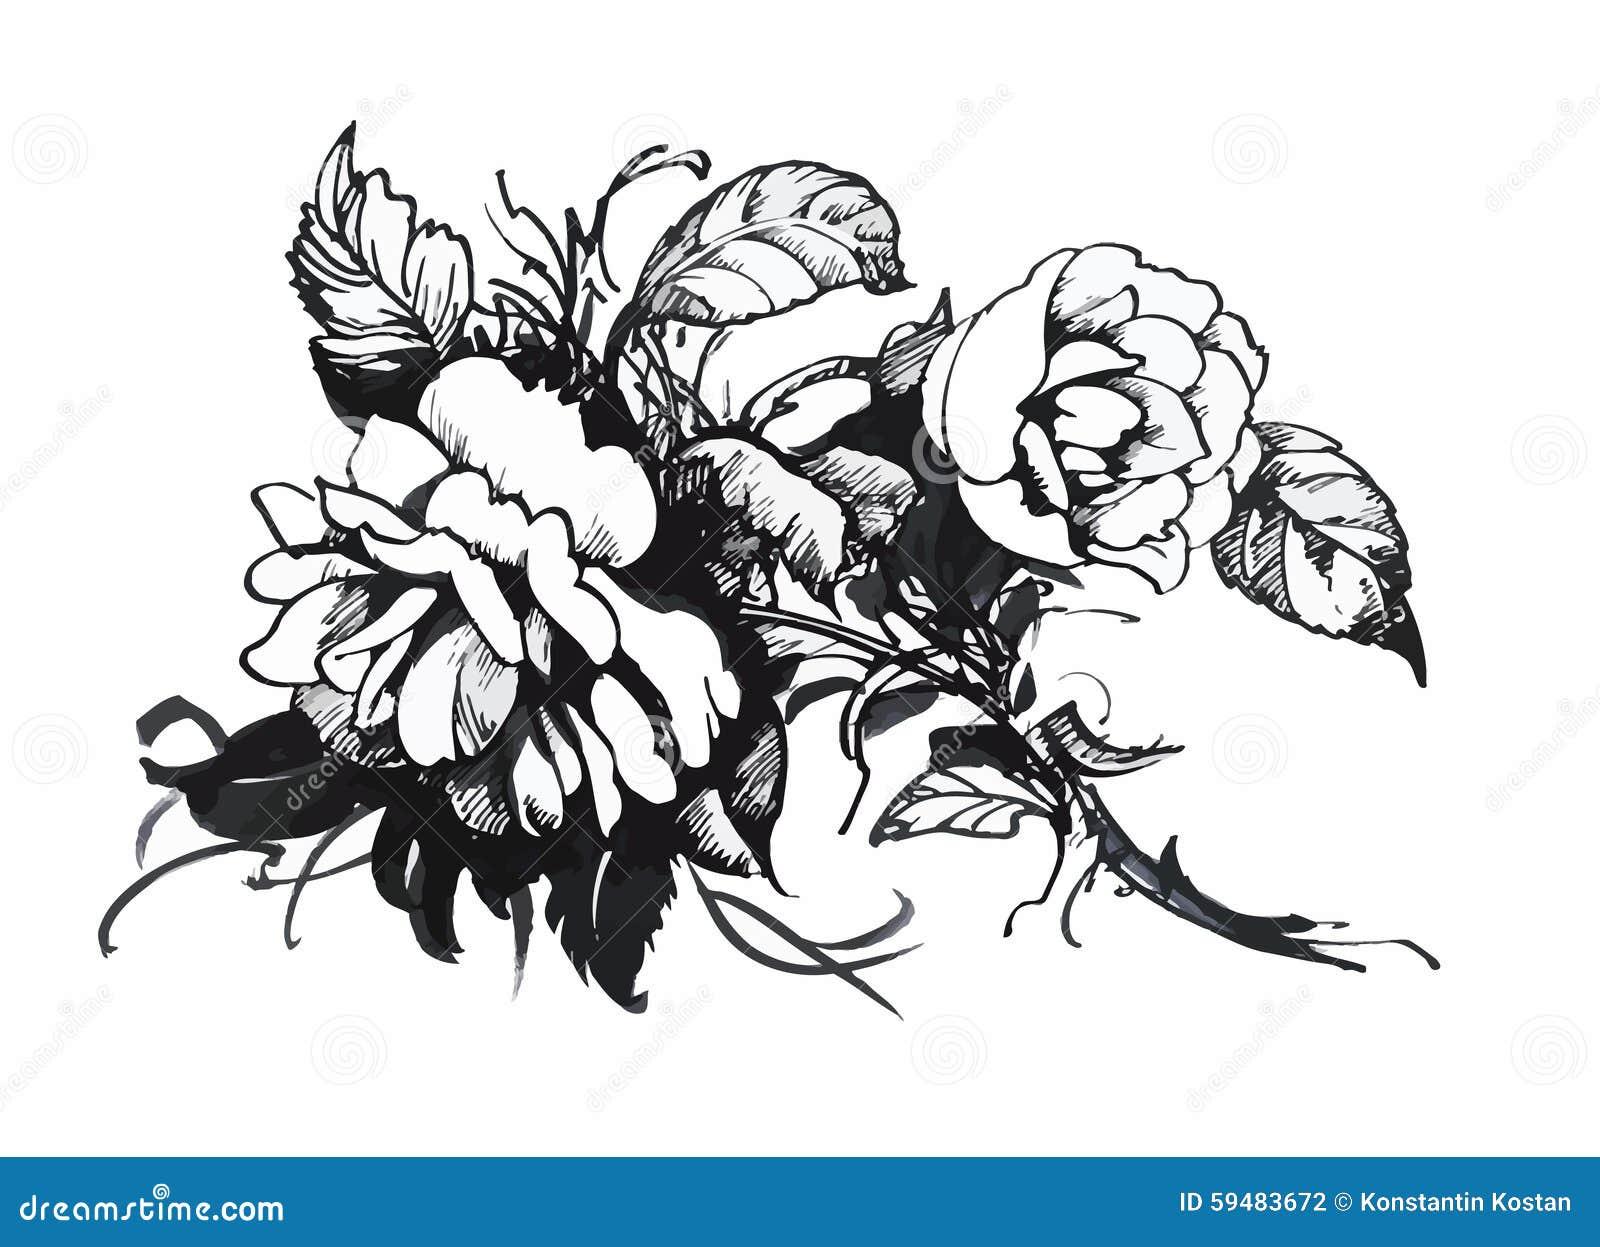 Beautiful monochrome black and white flower isolated hand drawn beautiful monochrome black and white flower isolated hand drawn contour lines strokes mightylinksfo